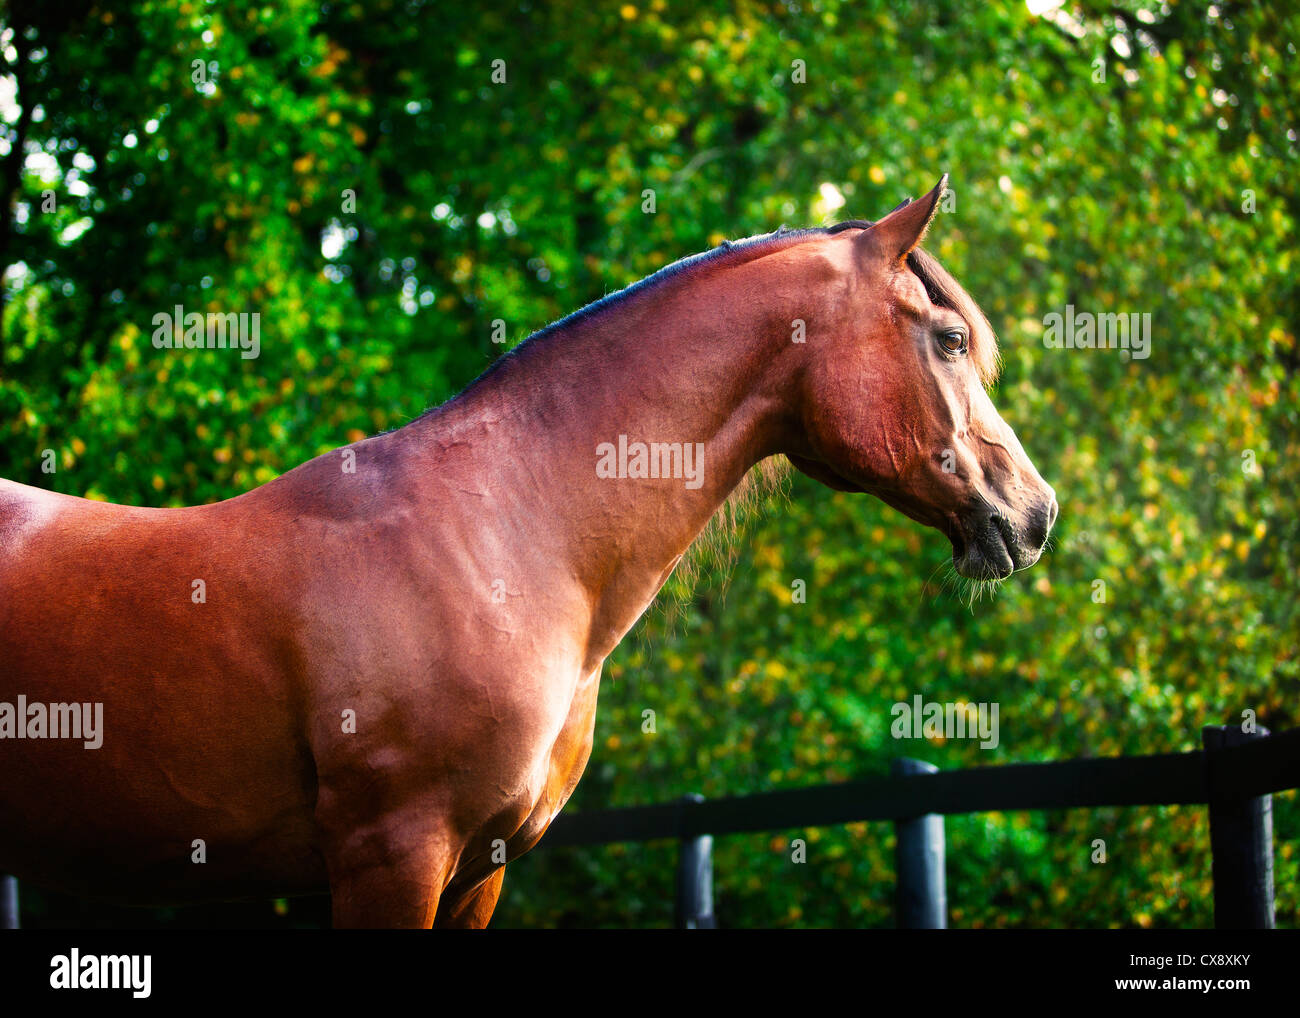 Polish Arabian bay male horse looking over fence portrait - Stock Image